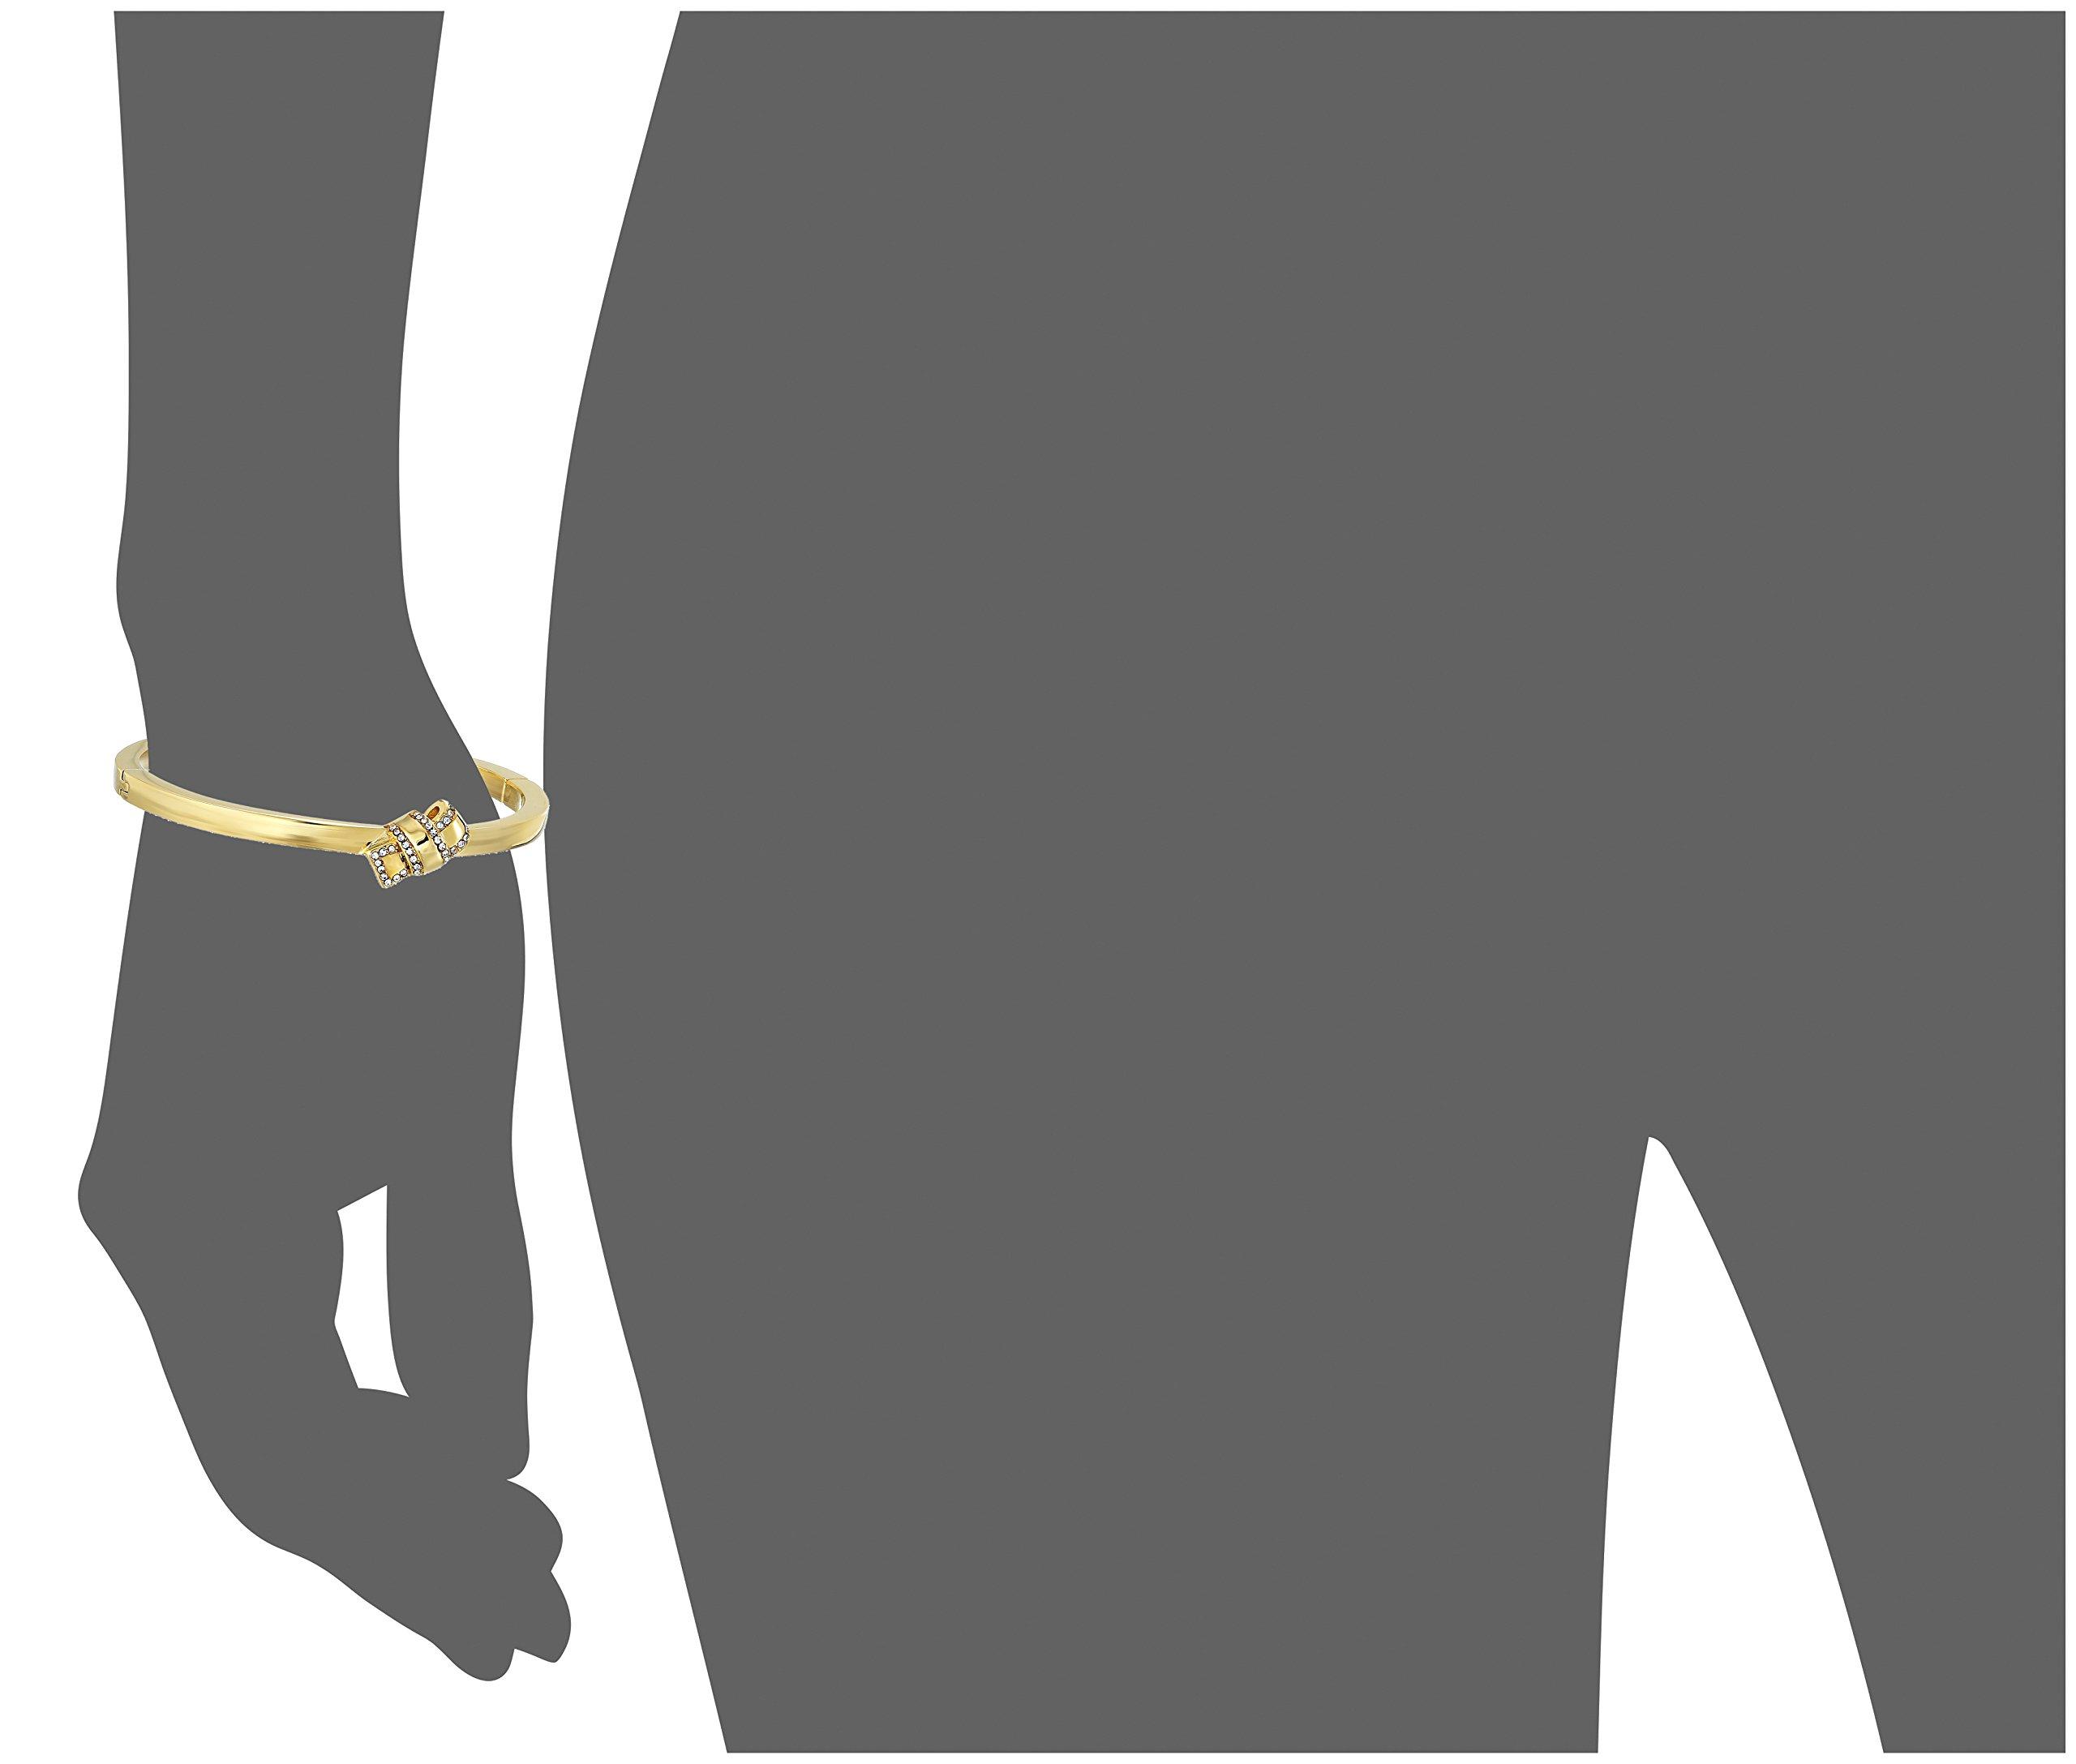 Kate Spade New York Pave Knot Hinged Gold Bangle Bracelet by Kate Spade New York (Image #2)